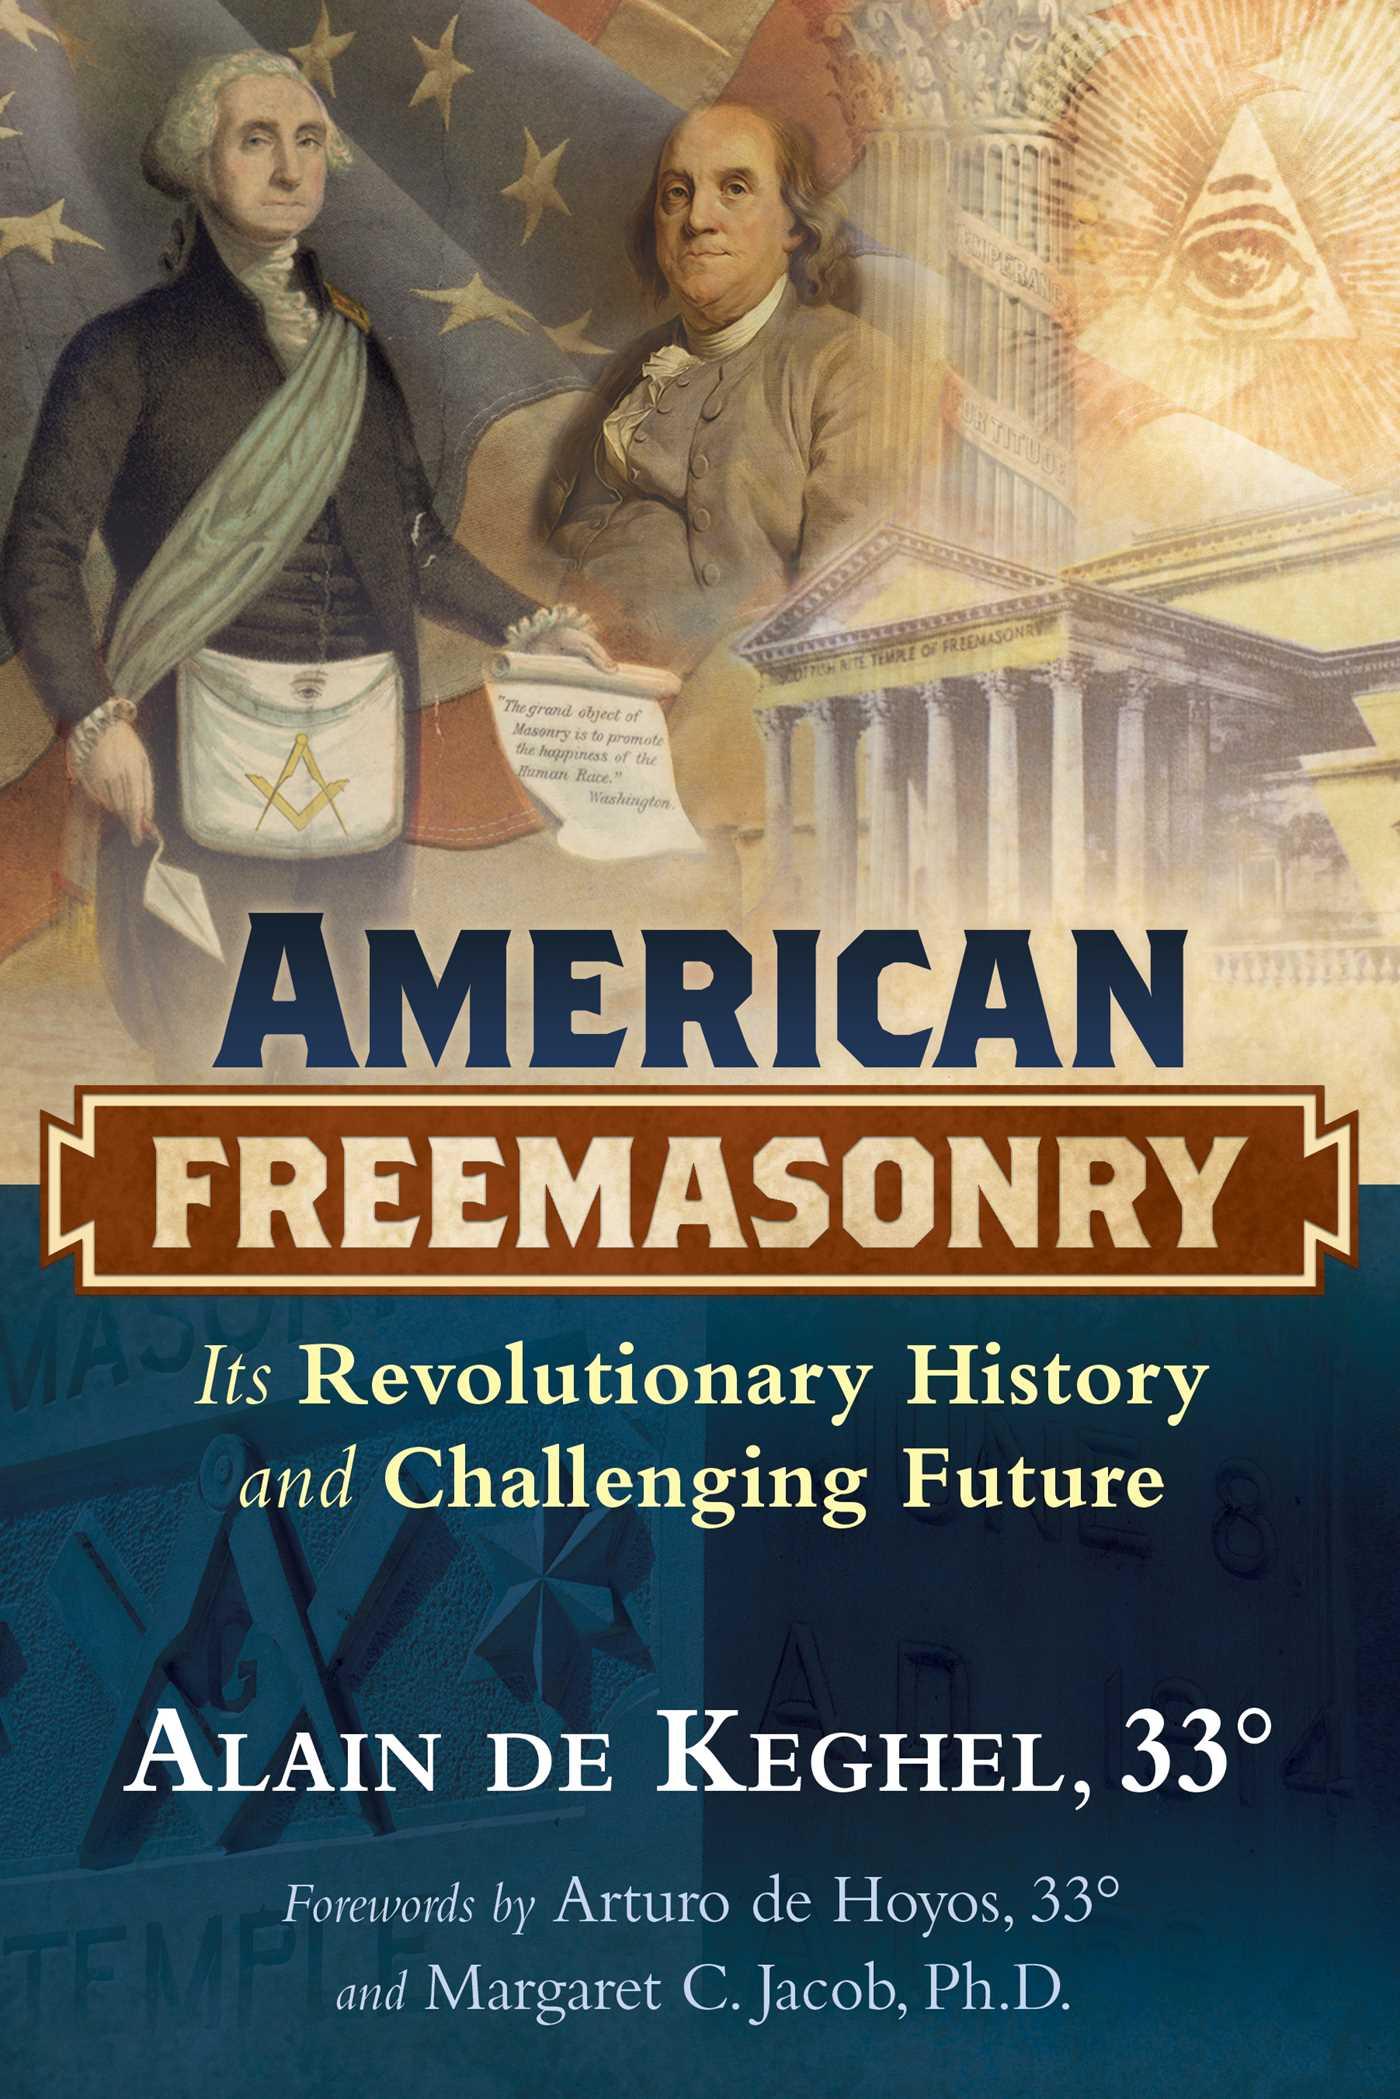 American freemasonry 9781620556054 hr